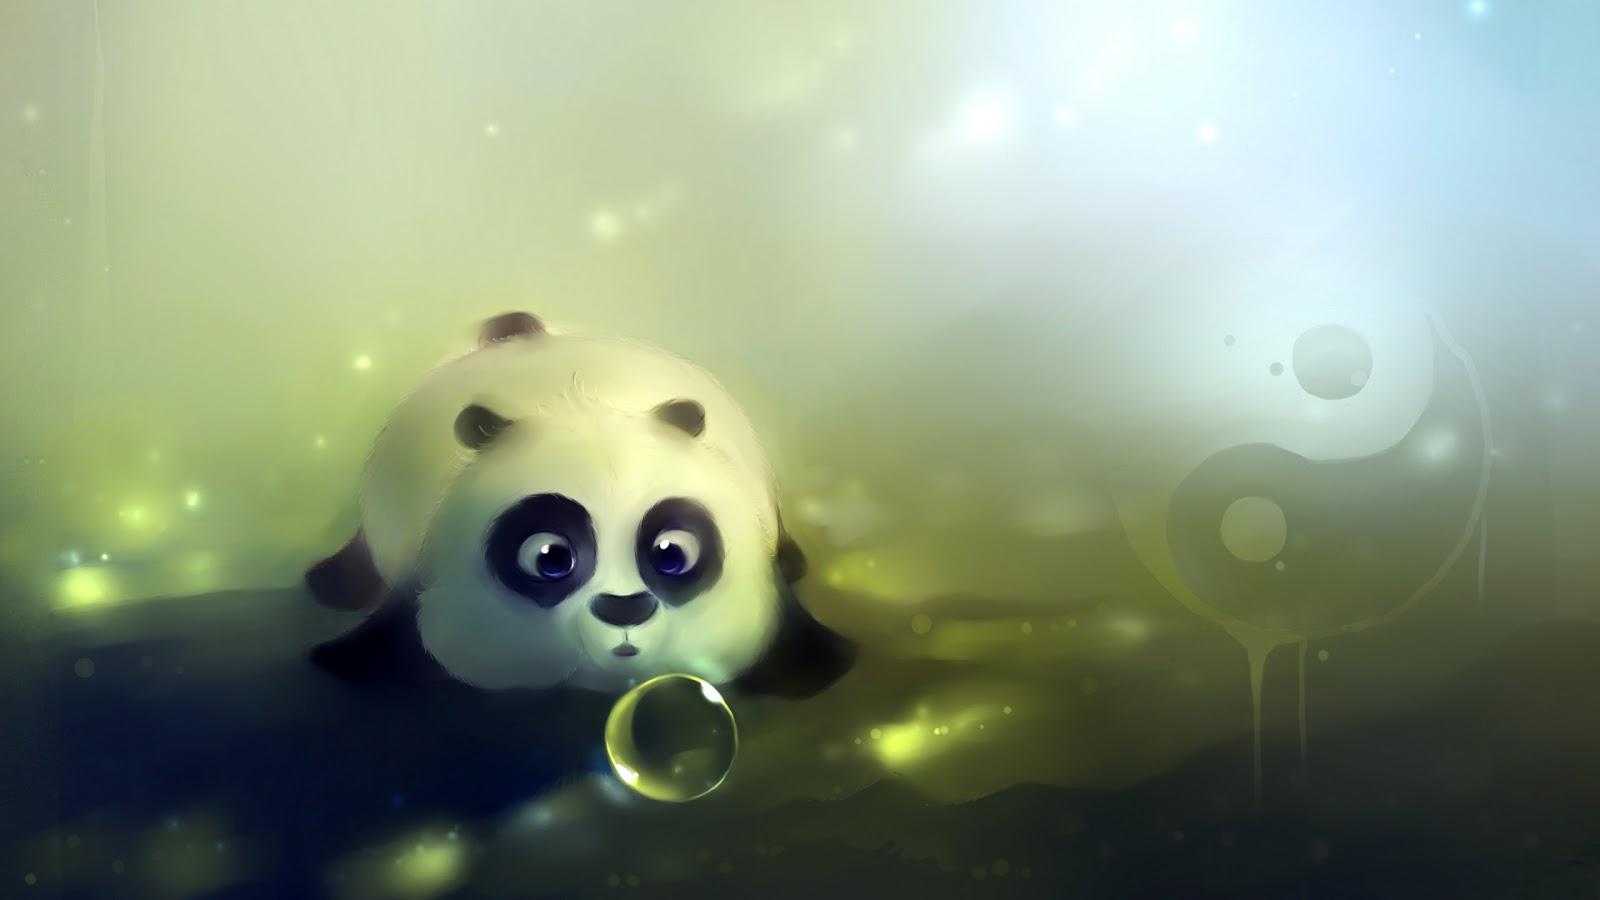 Fondo de Pantalla Animales Oso panda con burbuja - Imagenes ZT ...